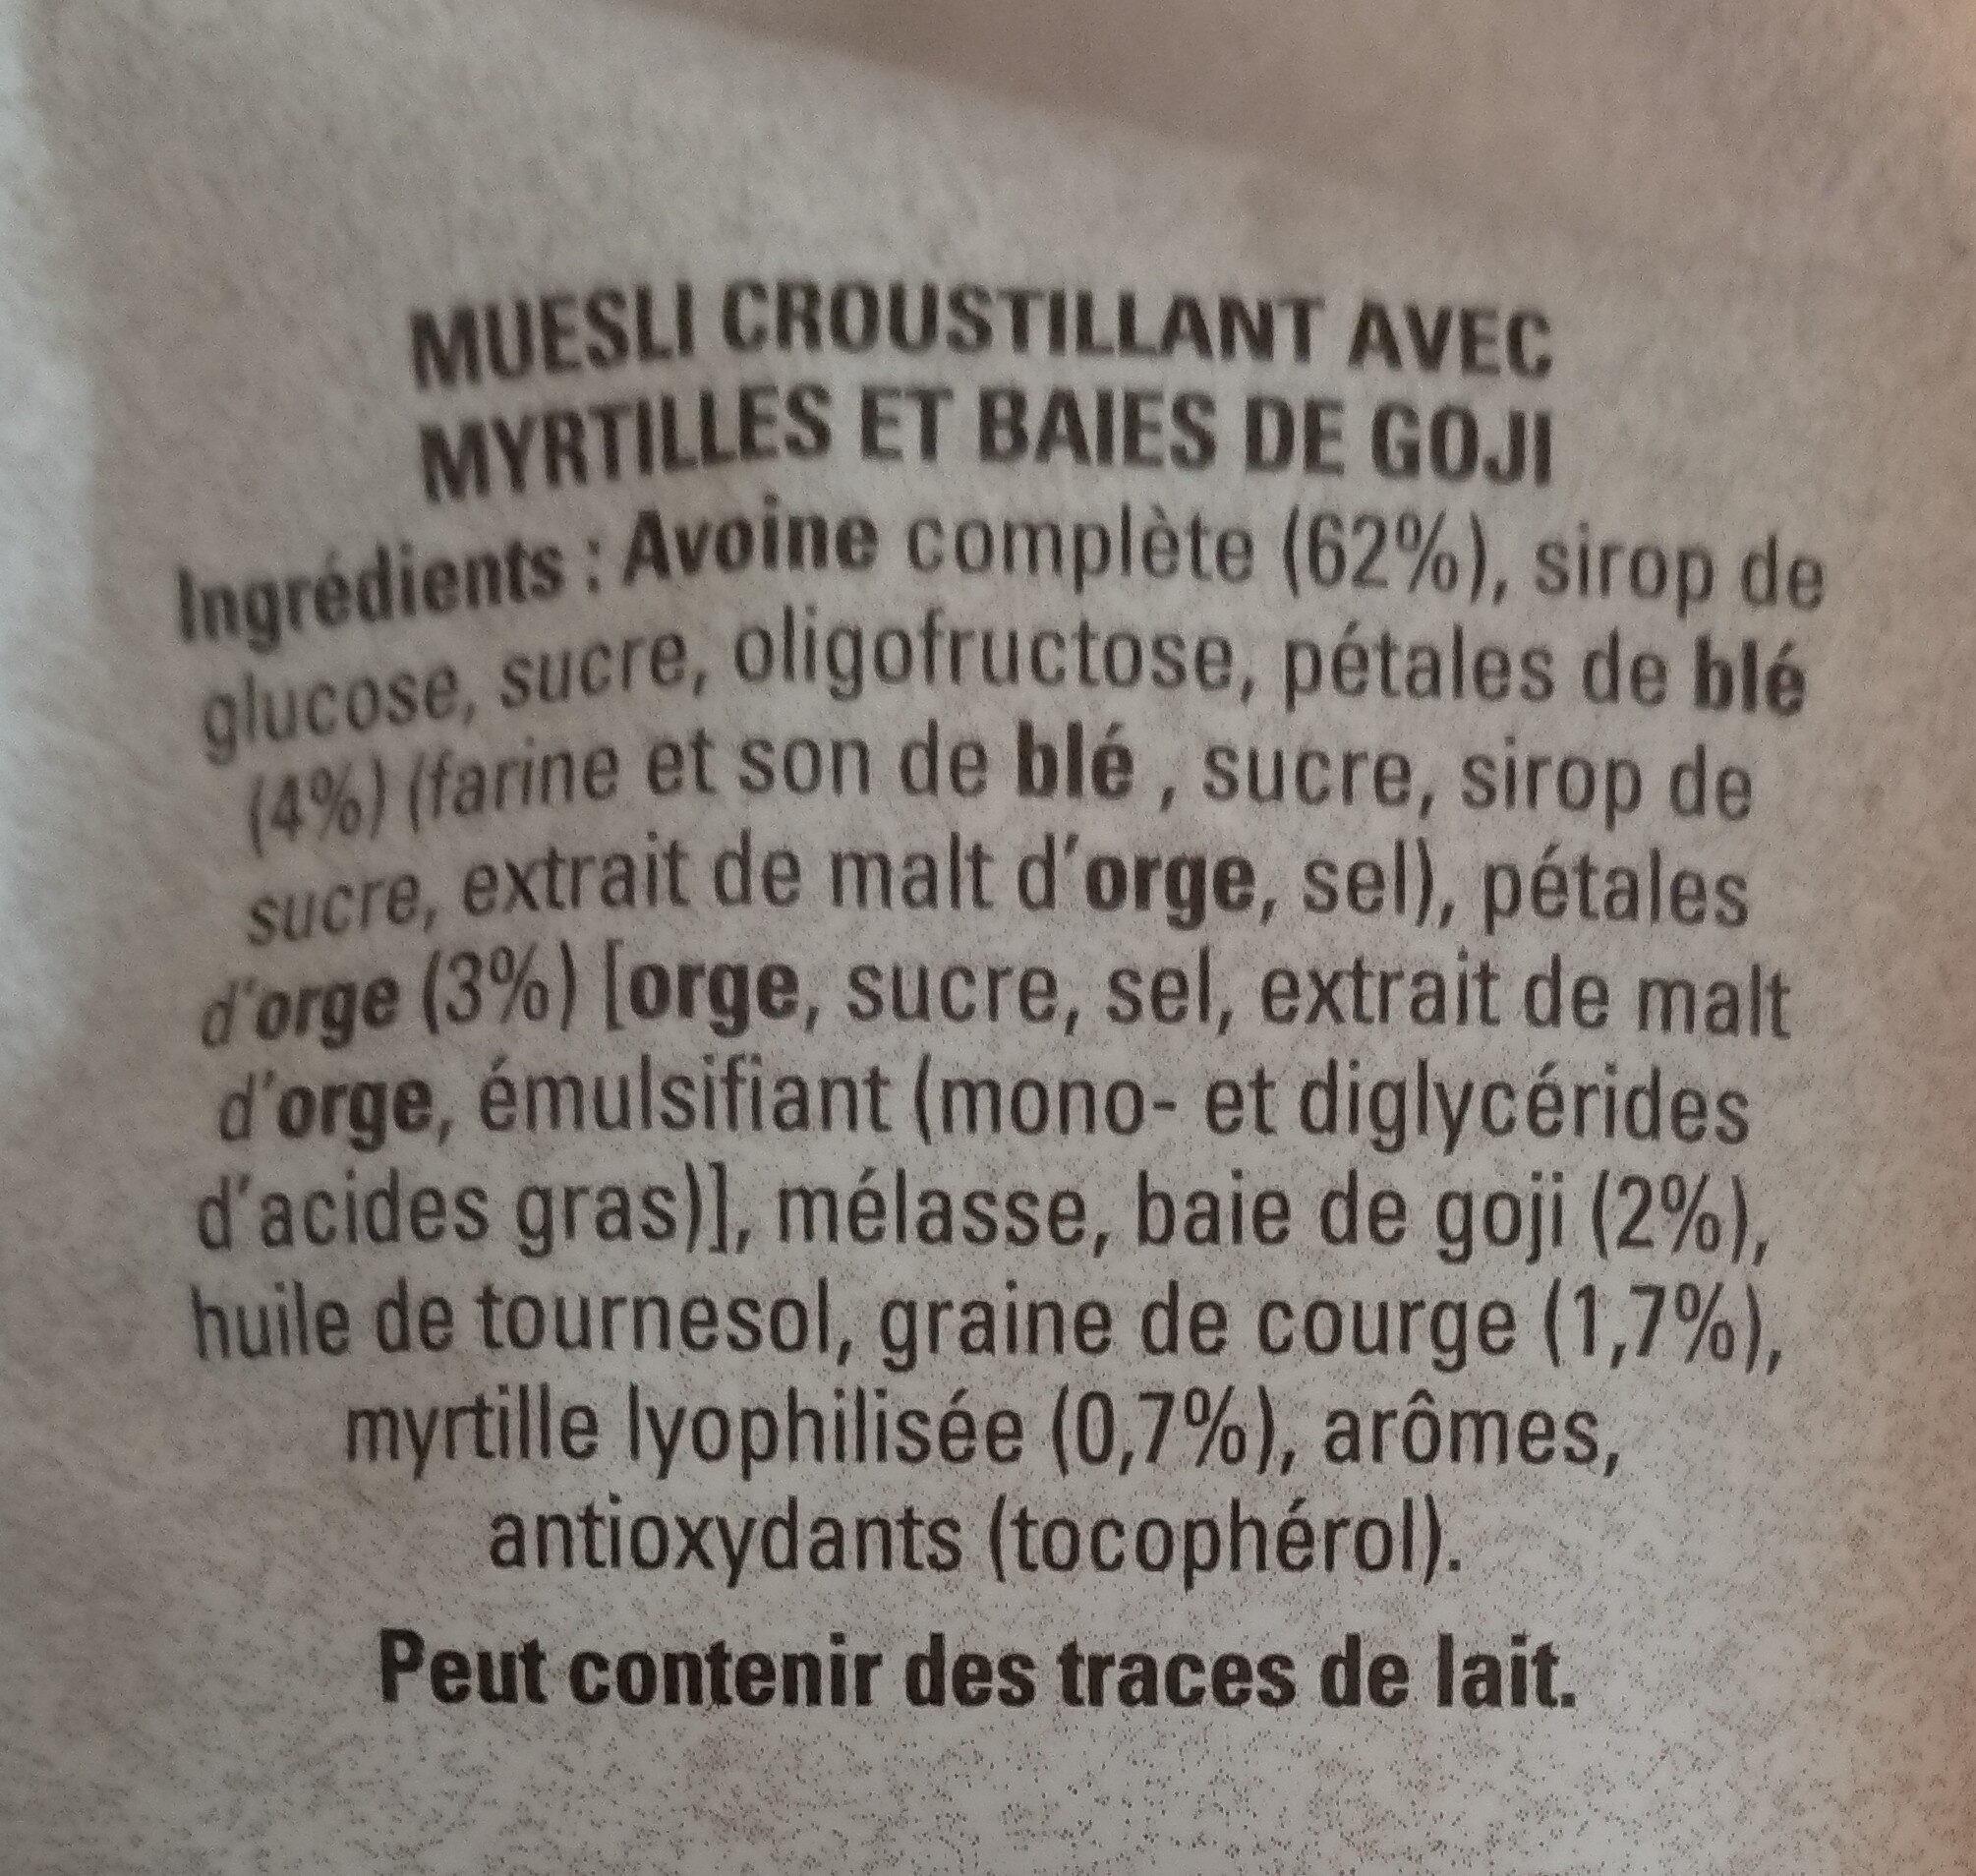 Quaker Muesli Croustillant Myrtilles & baies de goji - Ingrediënten - fr